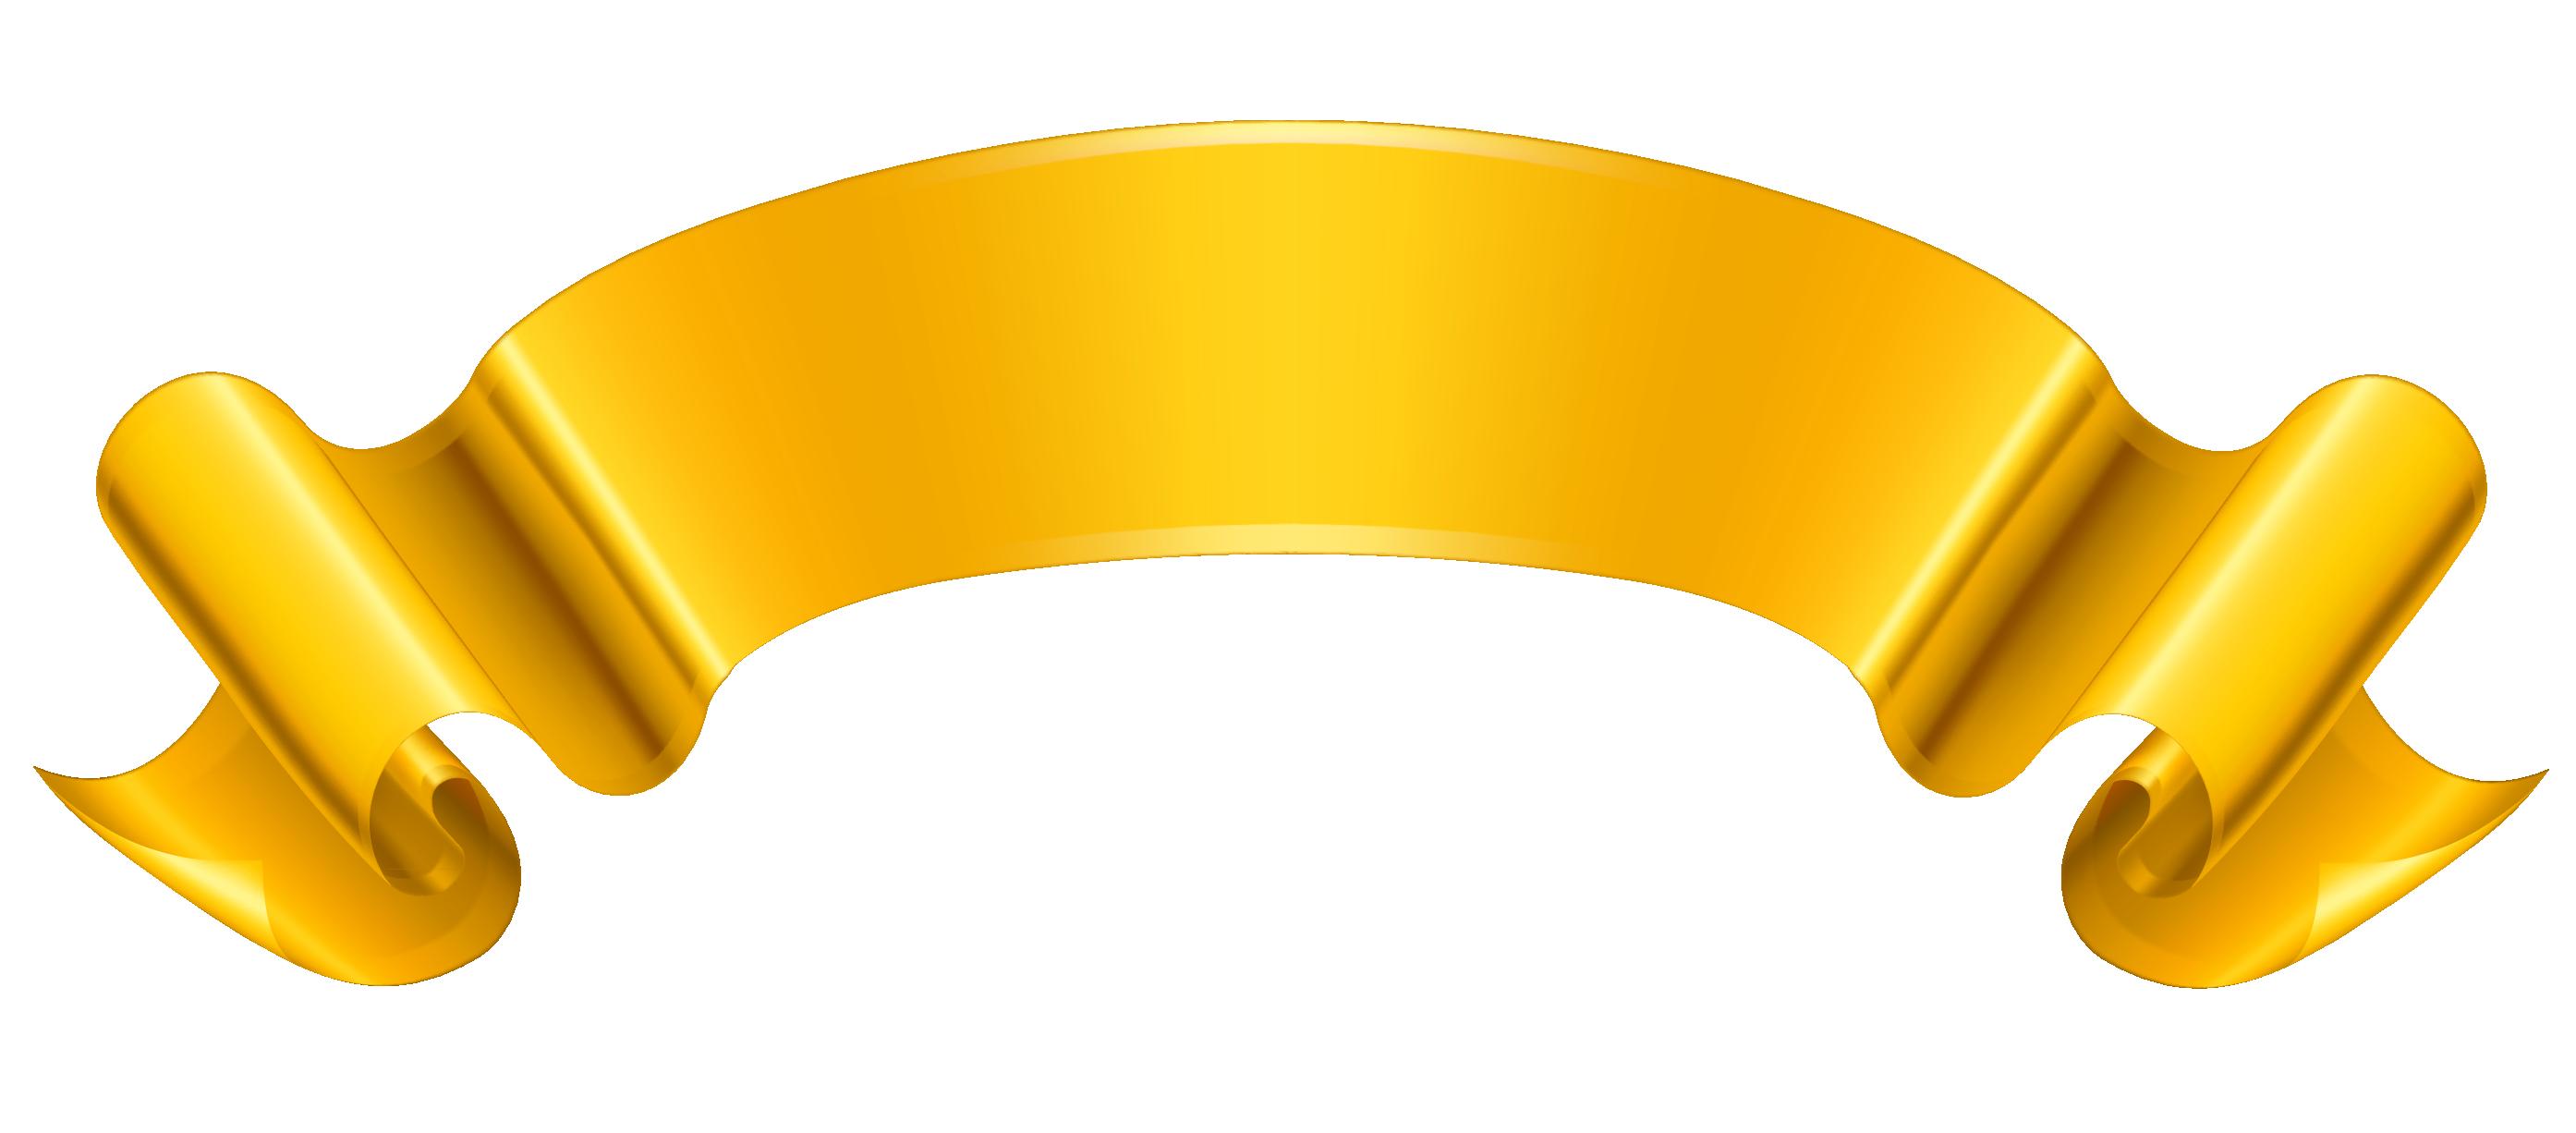 2788x1226 Gold Ribbon Clipart